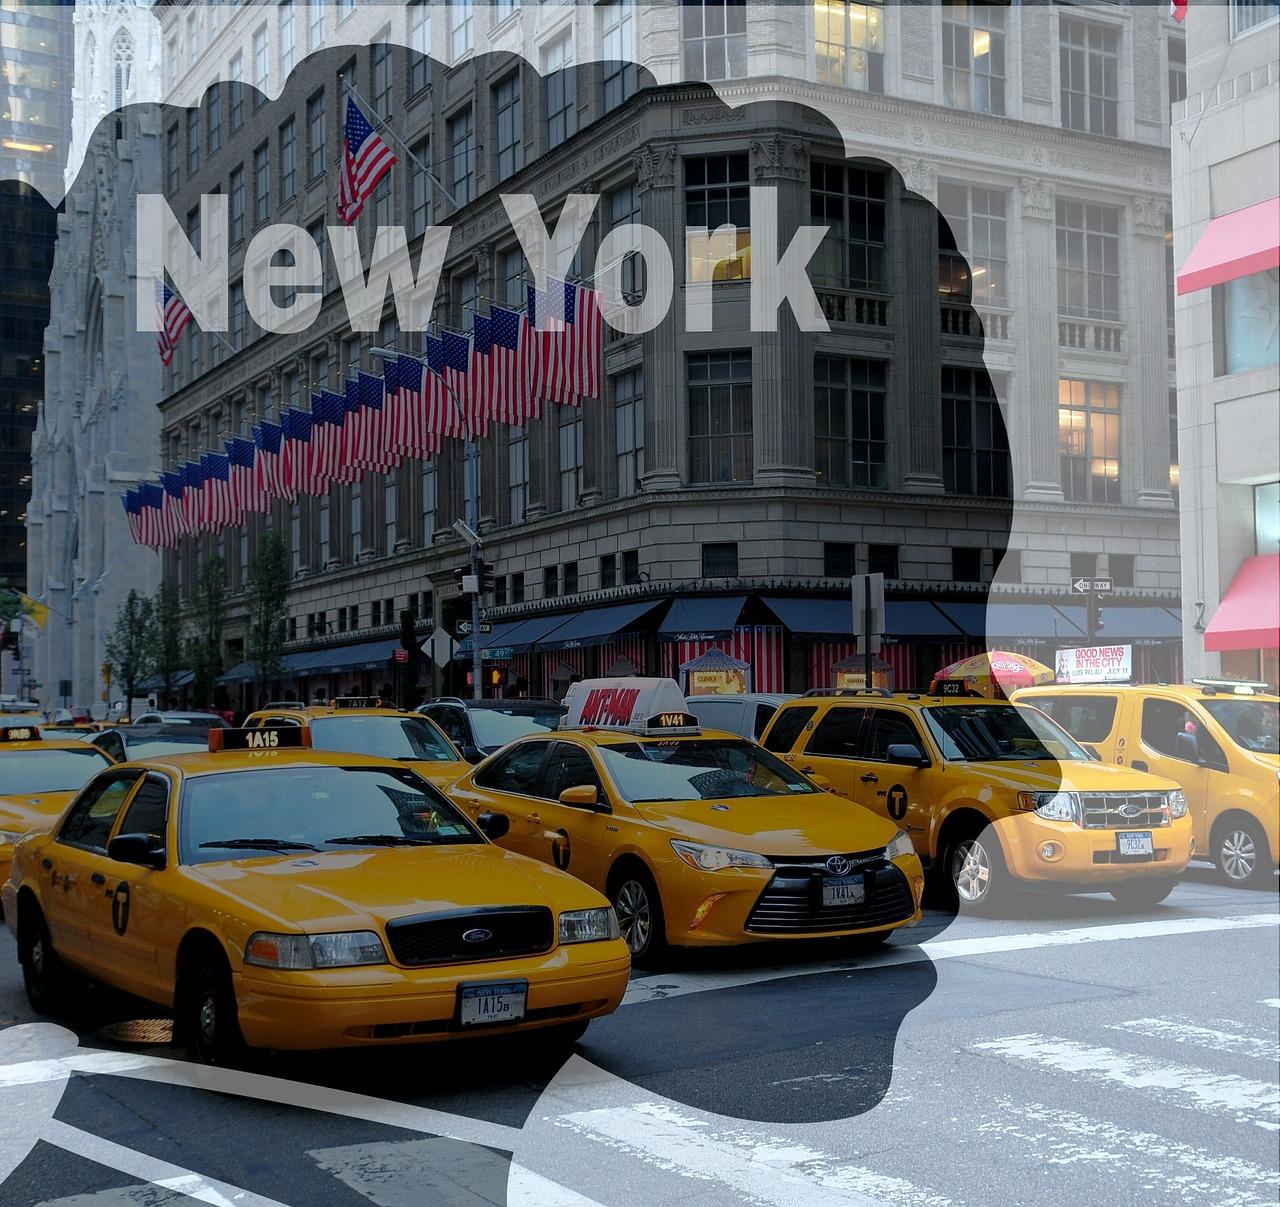 new-york-1113916_1280